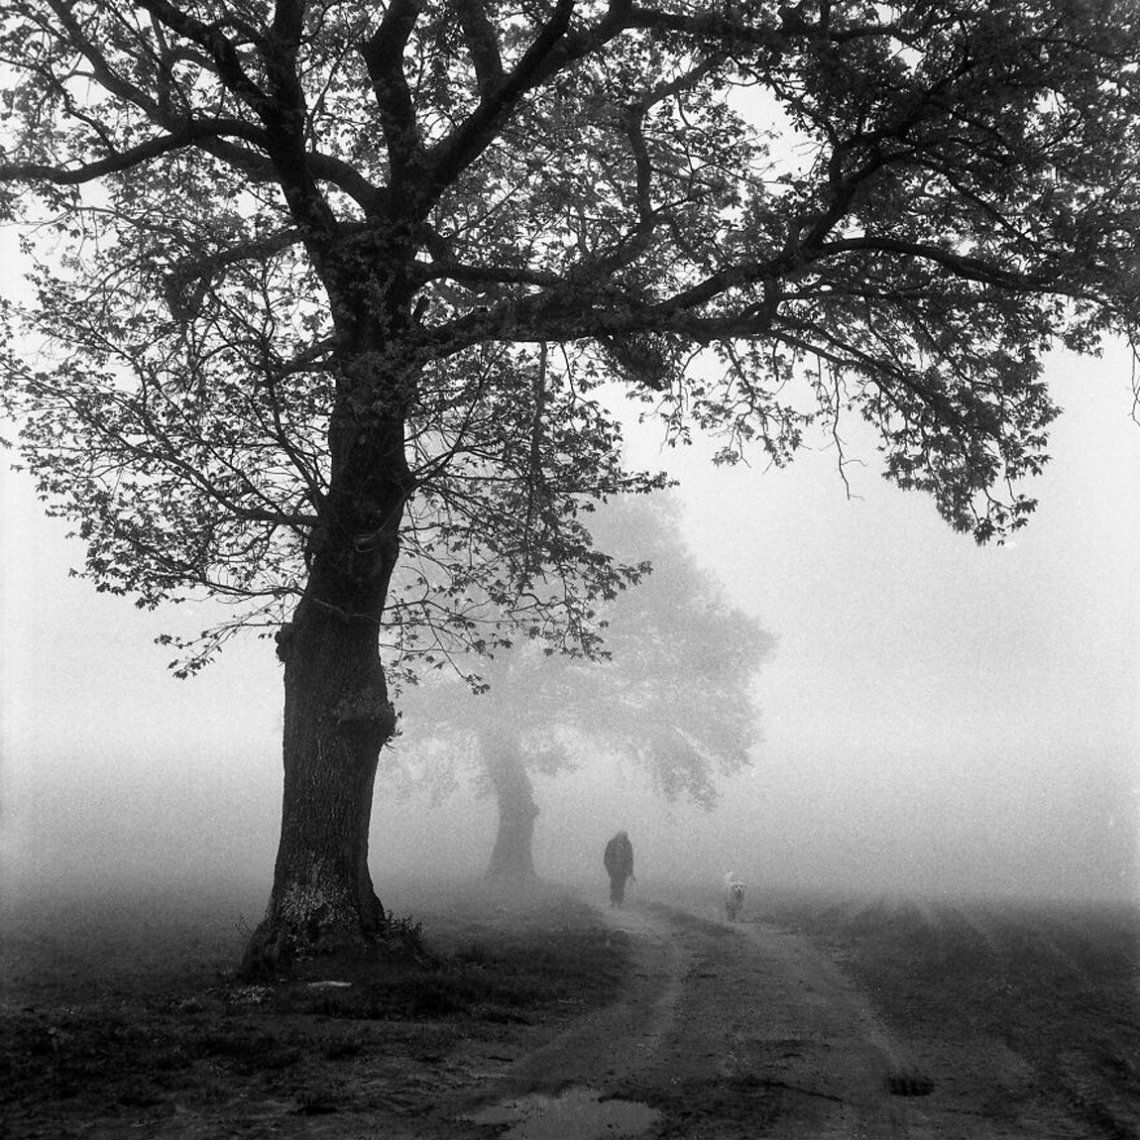 Walk In The Fog (2do lugar / Analógico / Cine / Paisaje)